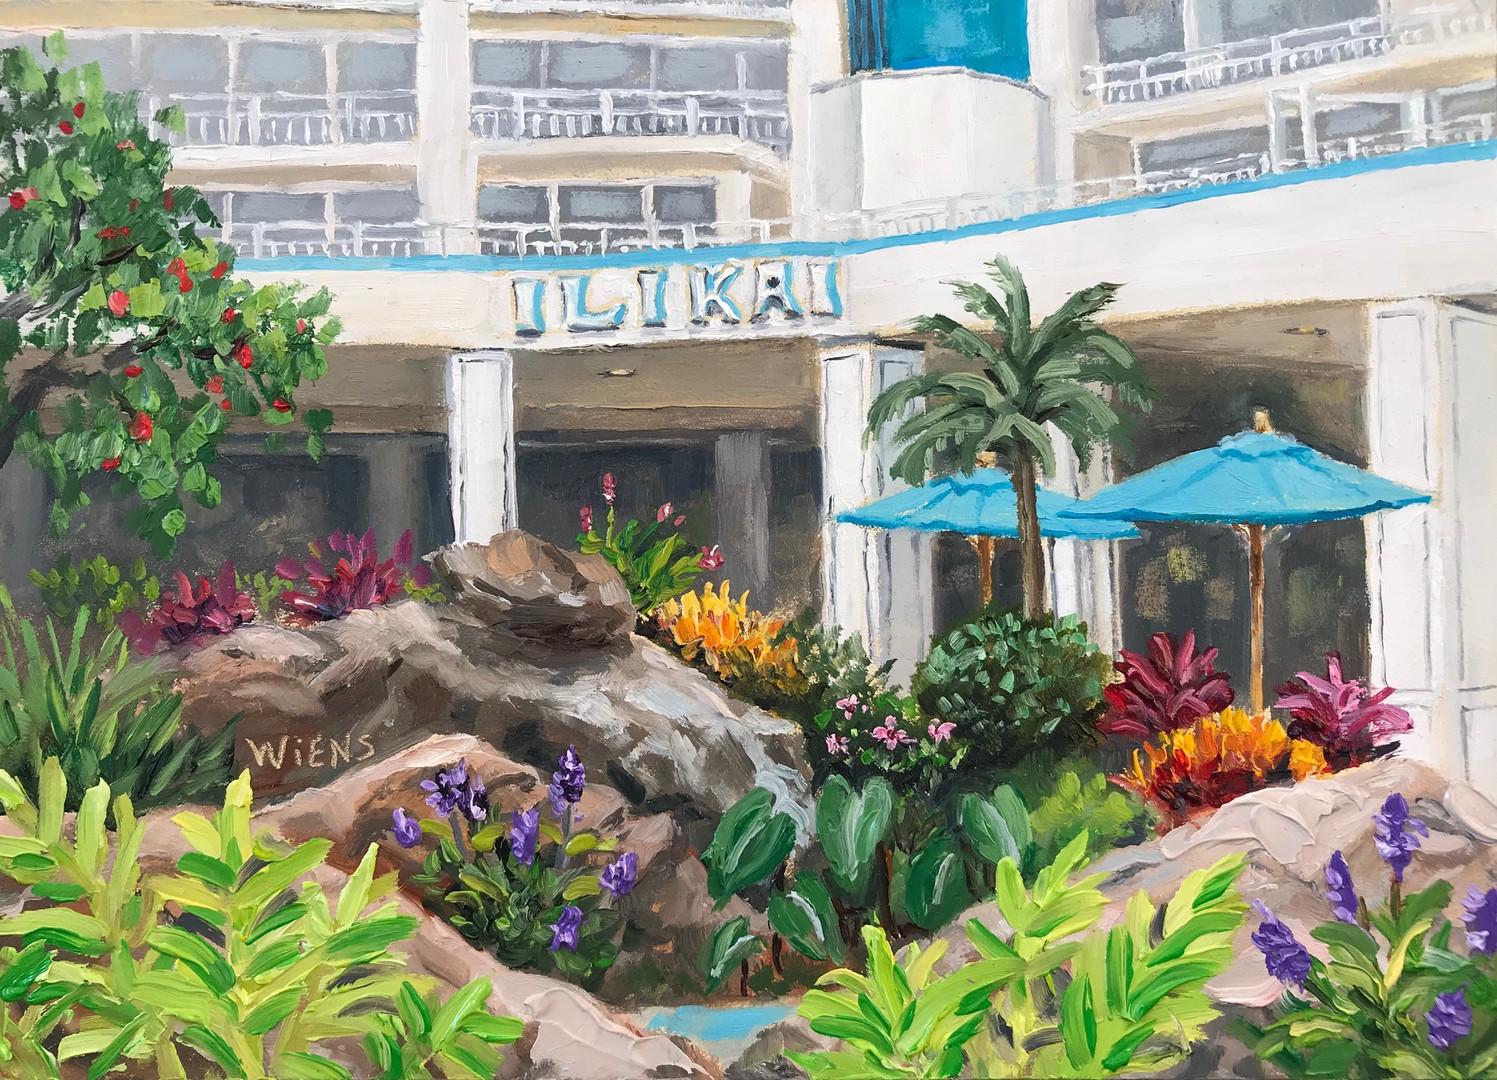 """Ilikai Hotel Gardens"""